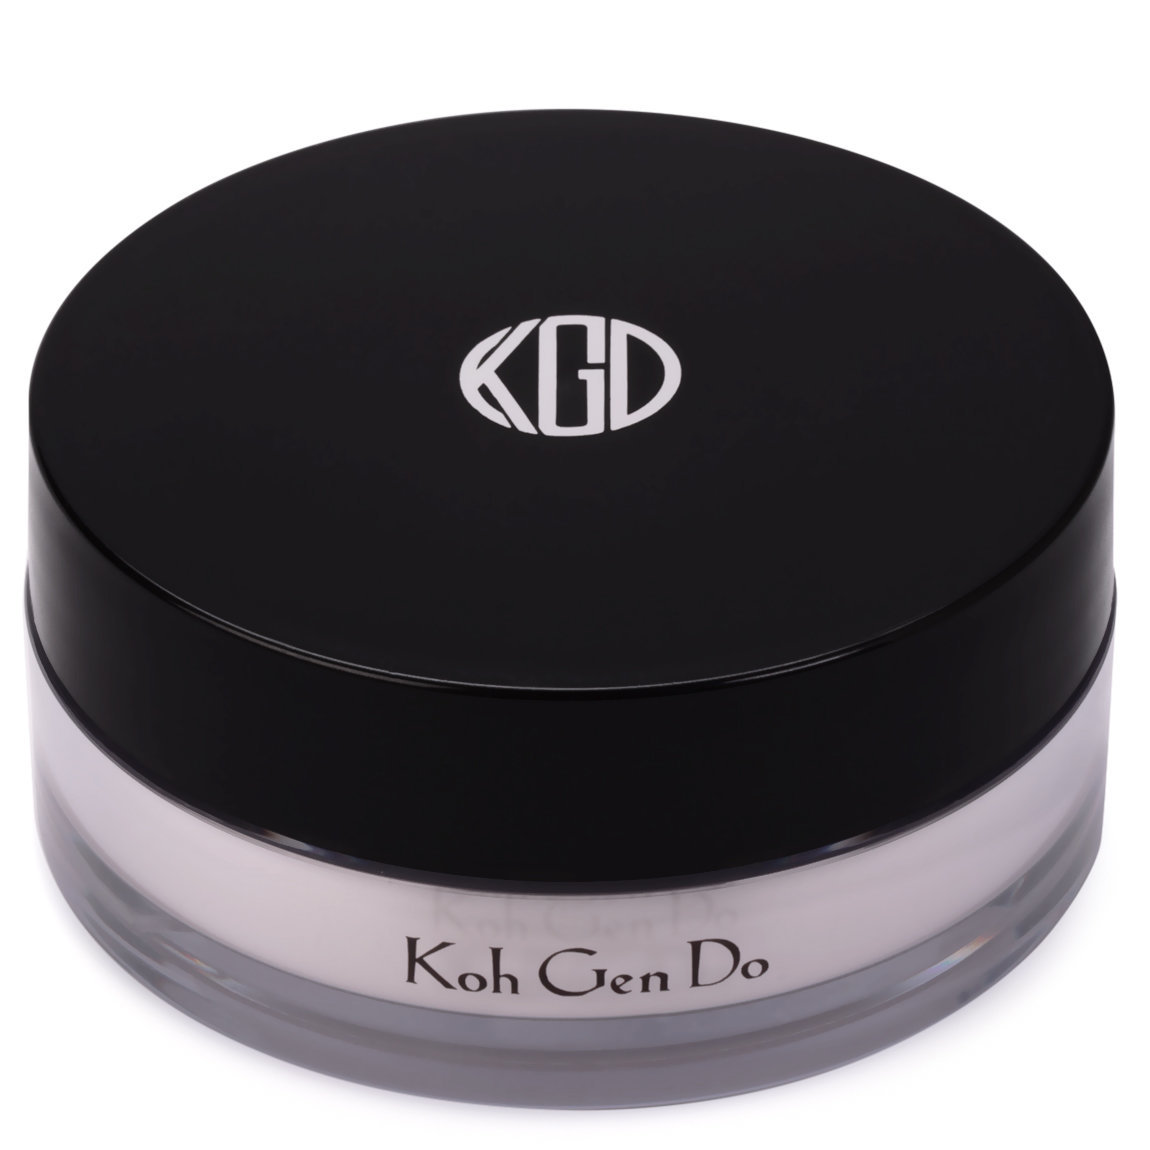 Koh Gen Do Maifanshi Face Powder alternative view 1 - product swatch.